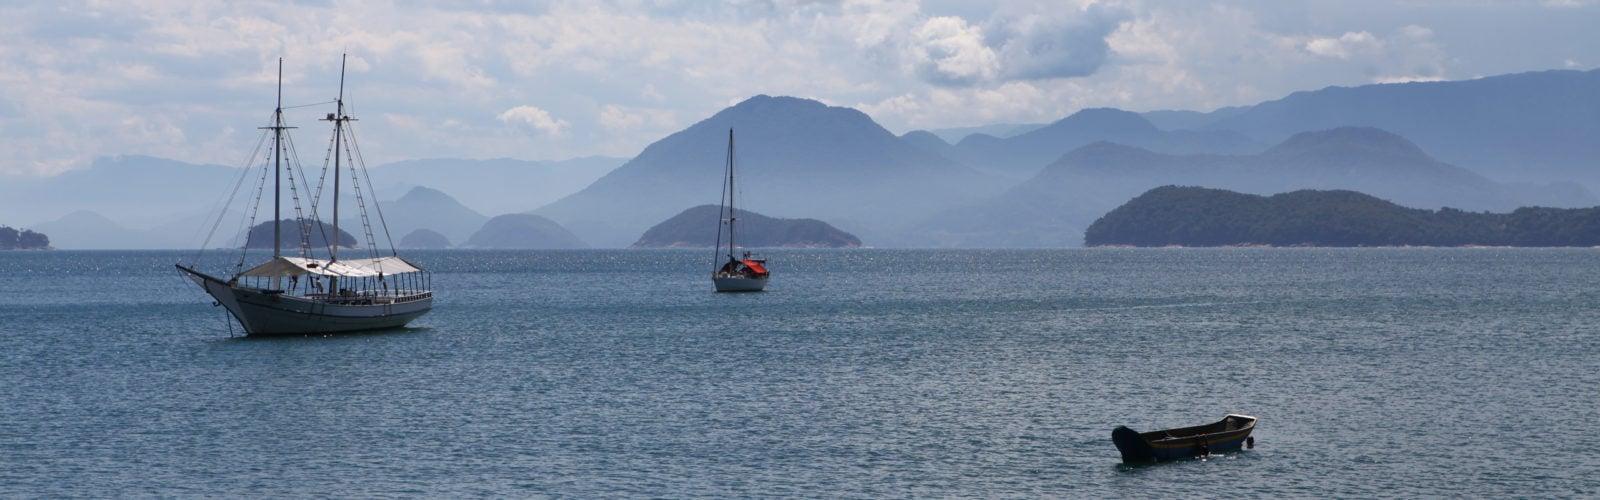 picinguaba-landscape-with-boats